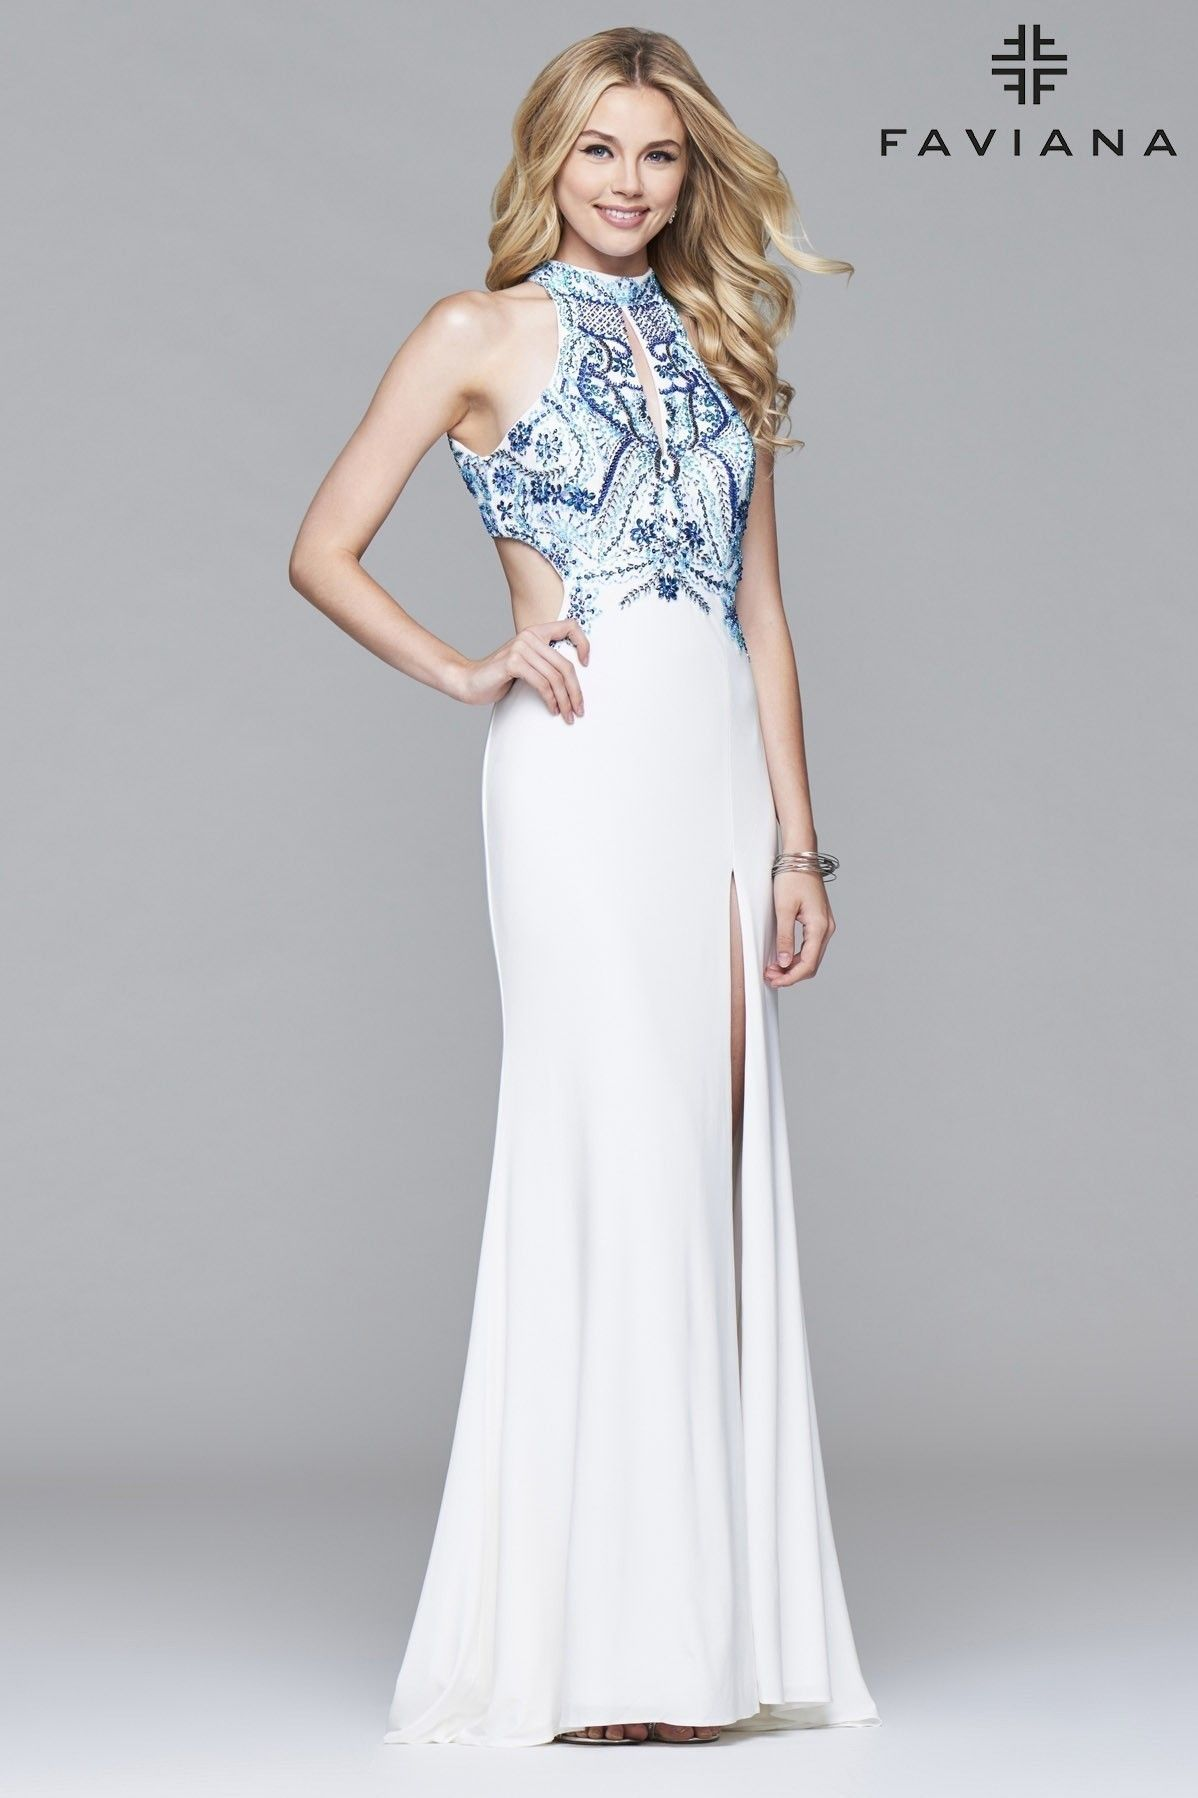 S all faviana dresses pinterest dresses prom dresses and prom